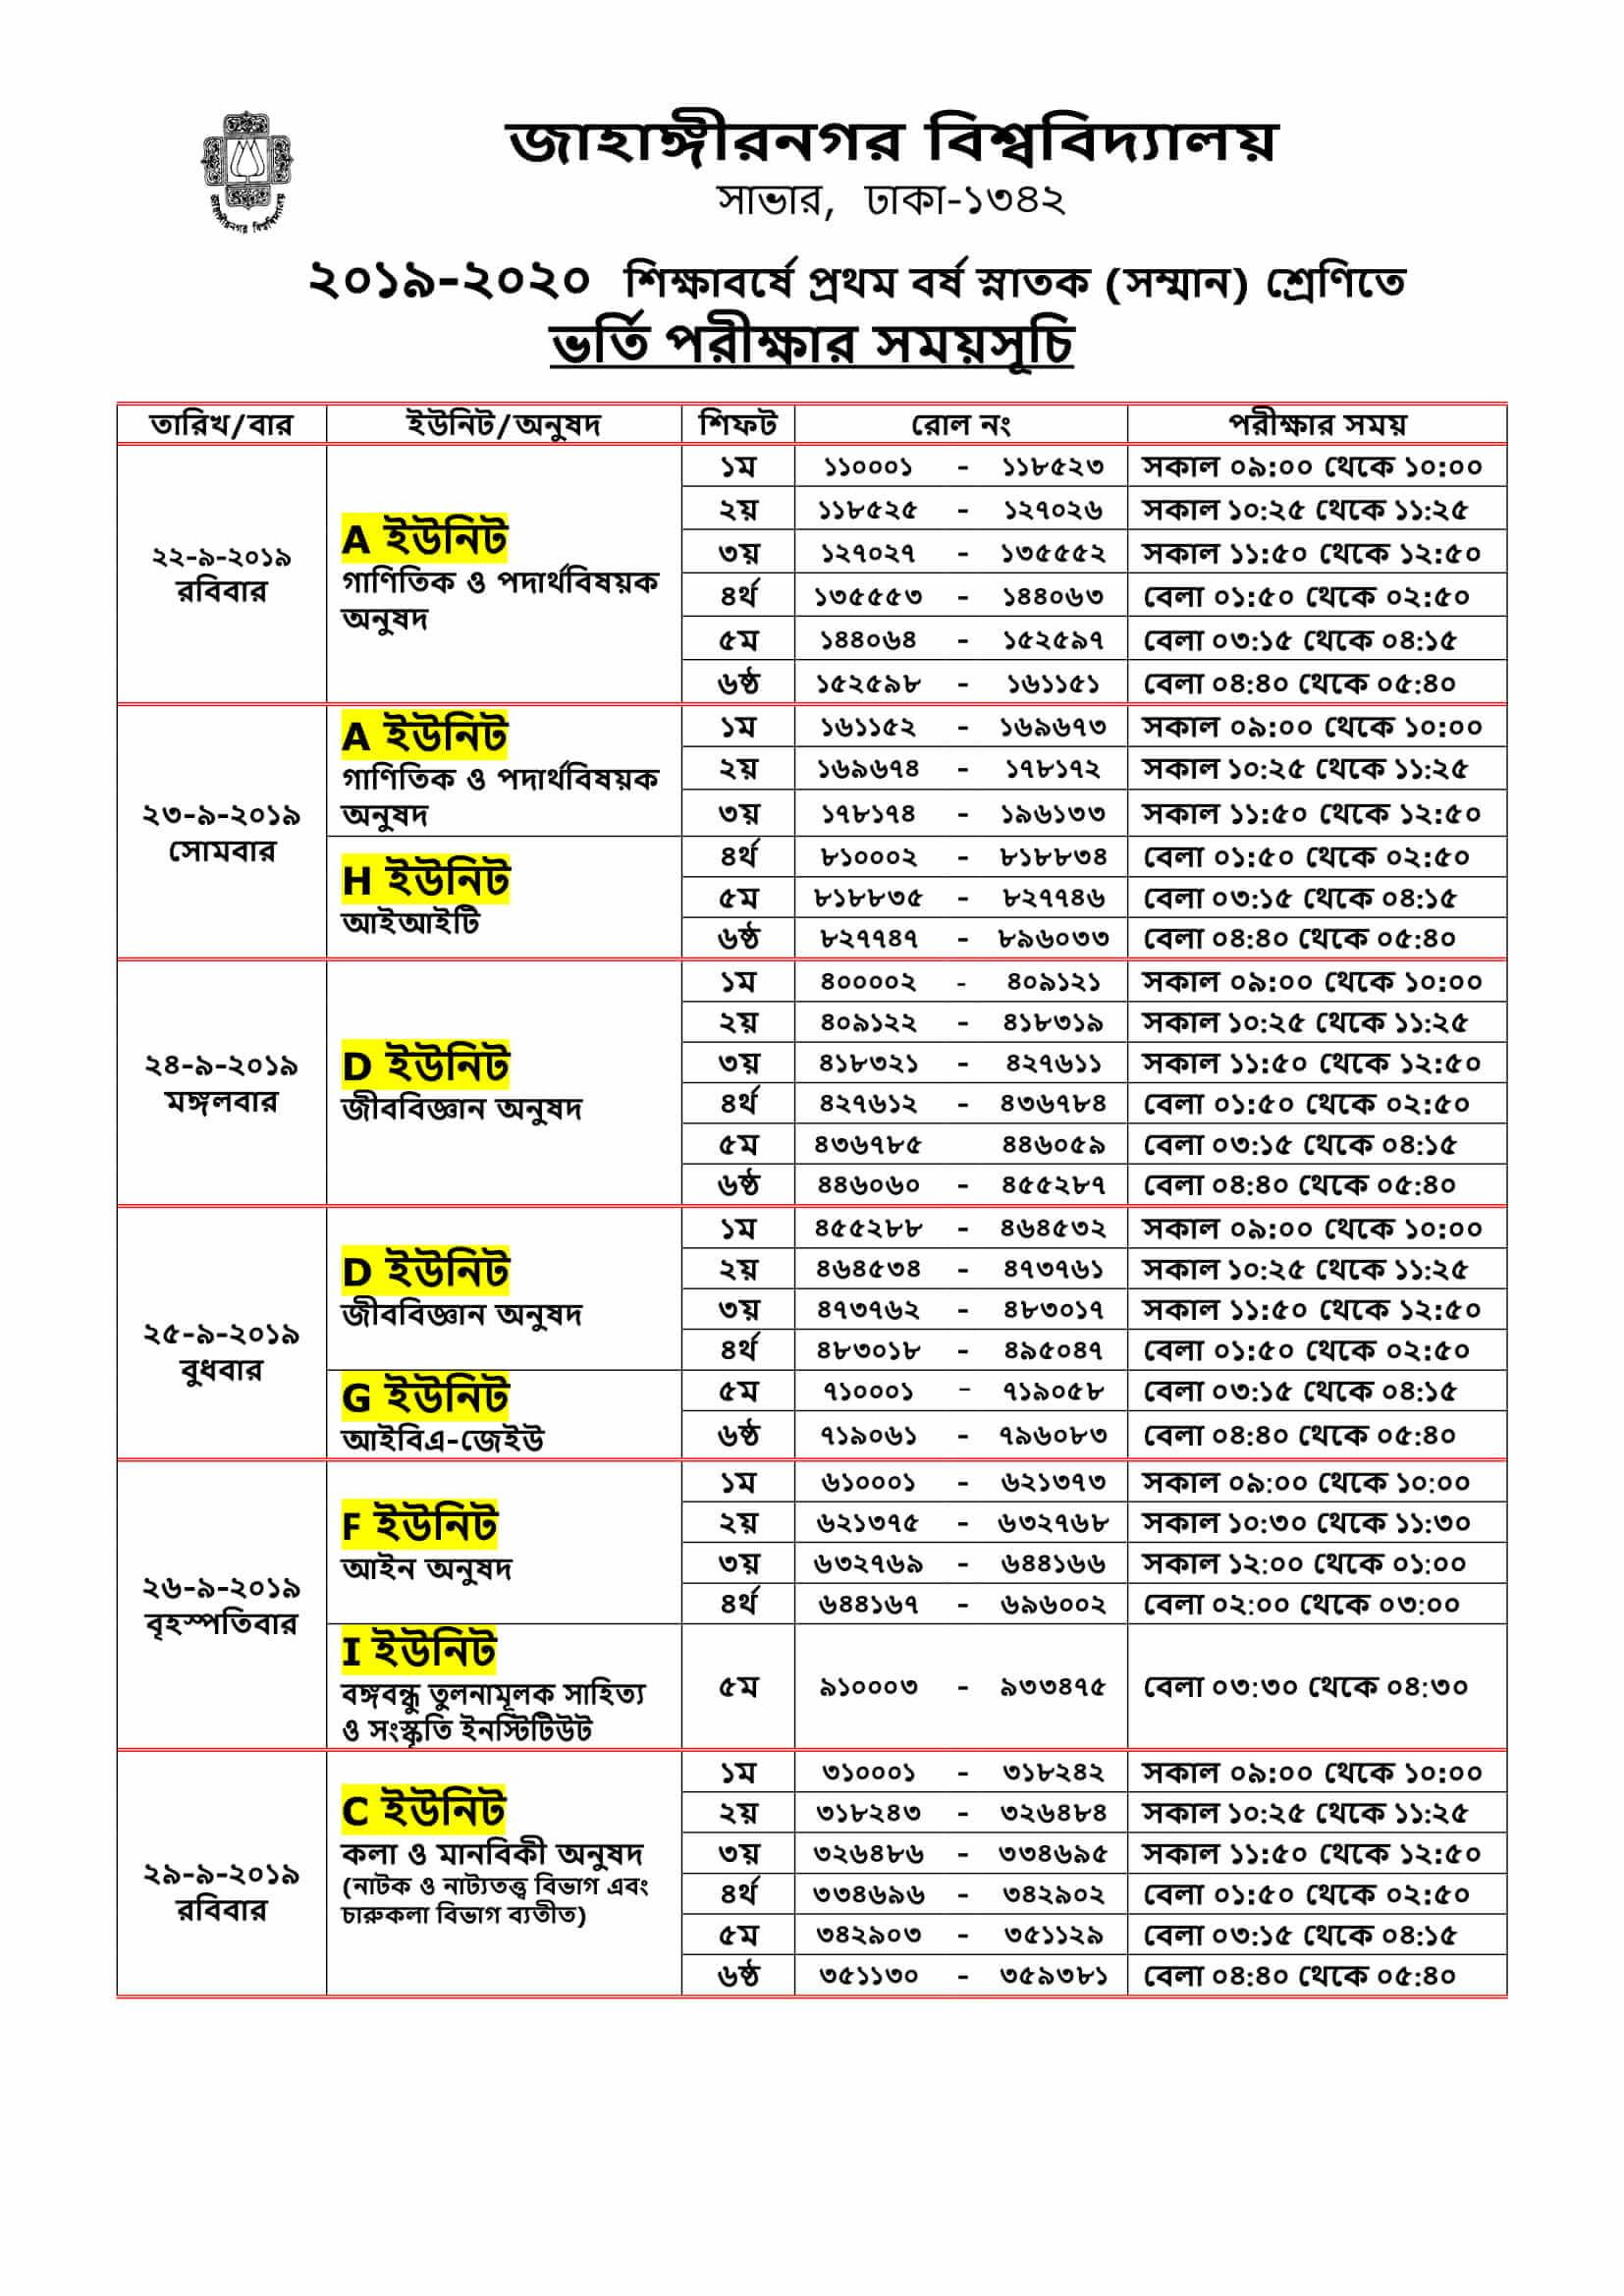 Jahangirnagar University Admission Exam Date